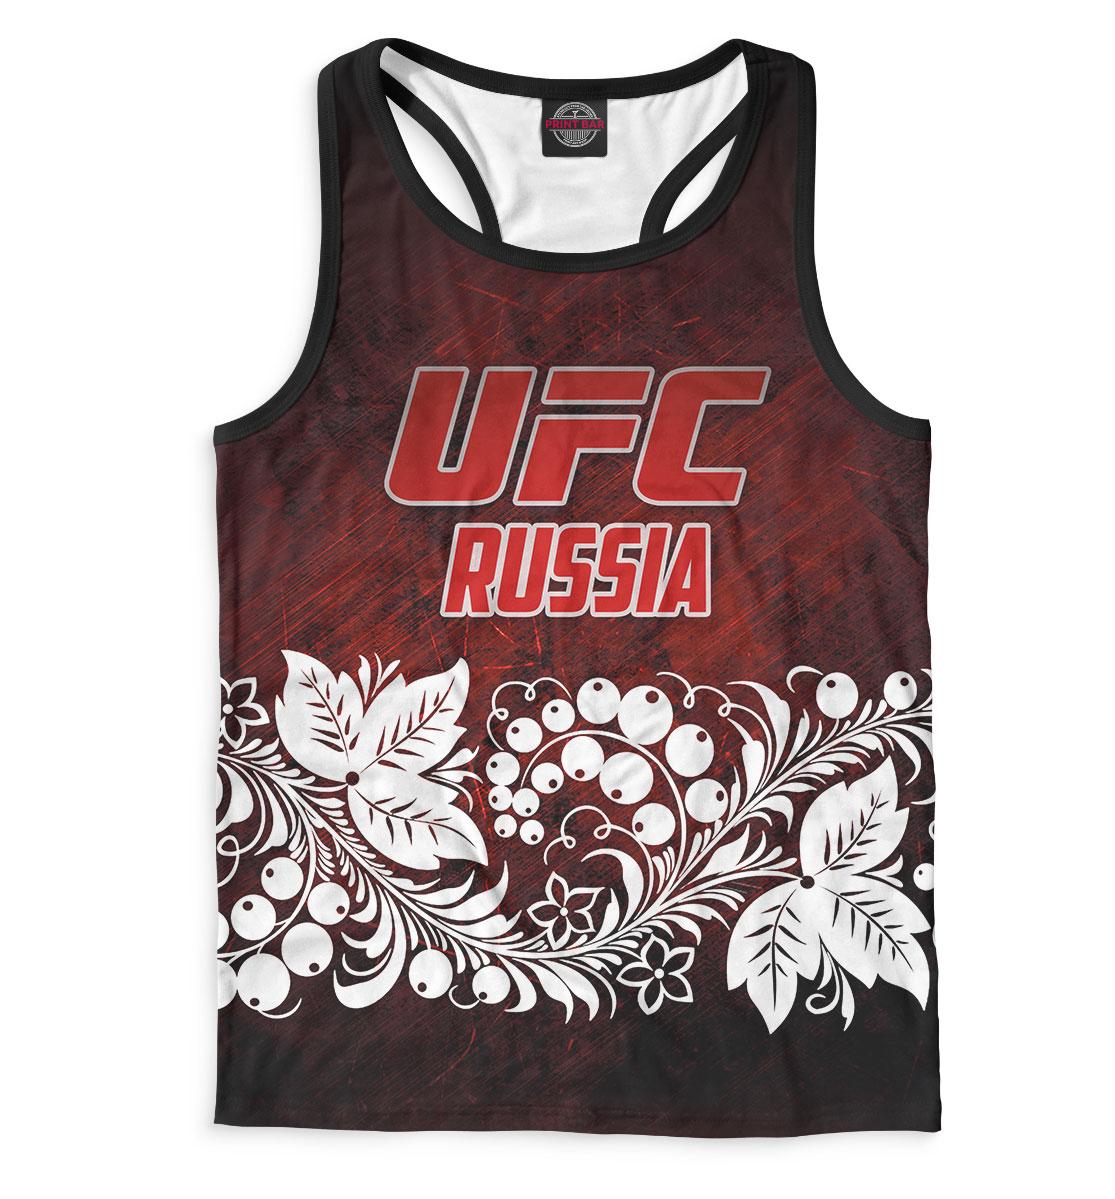 Купить UFC Russia, Printbar, Майки борцовки, MNU-613848-mayb-2